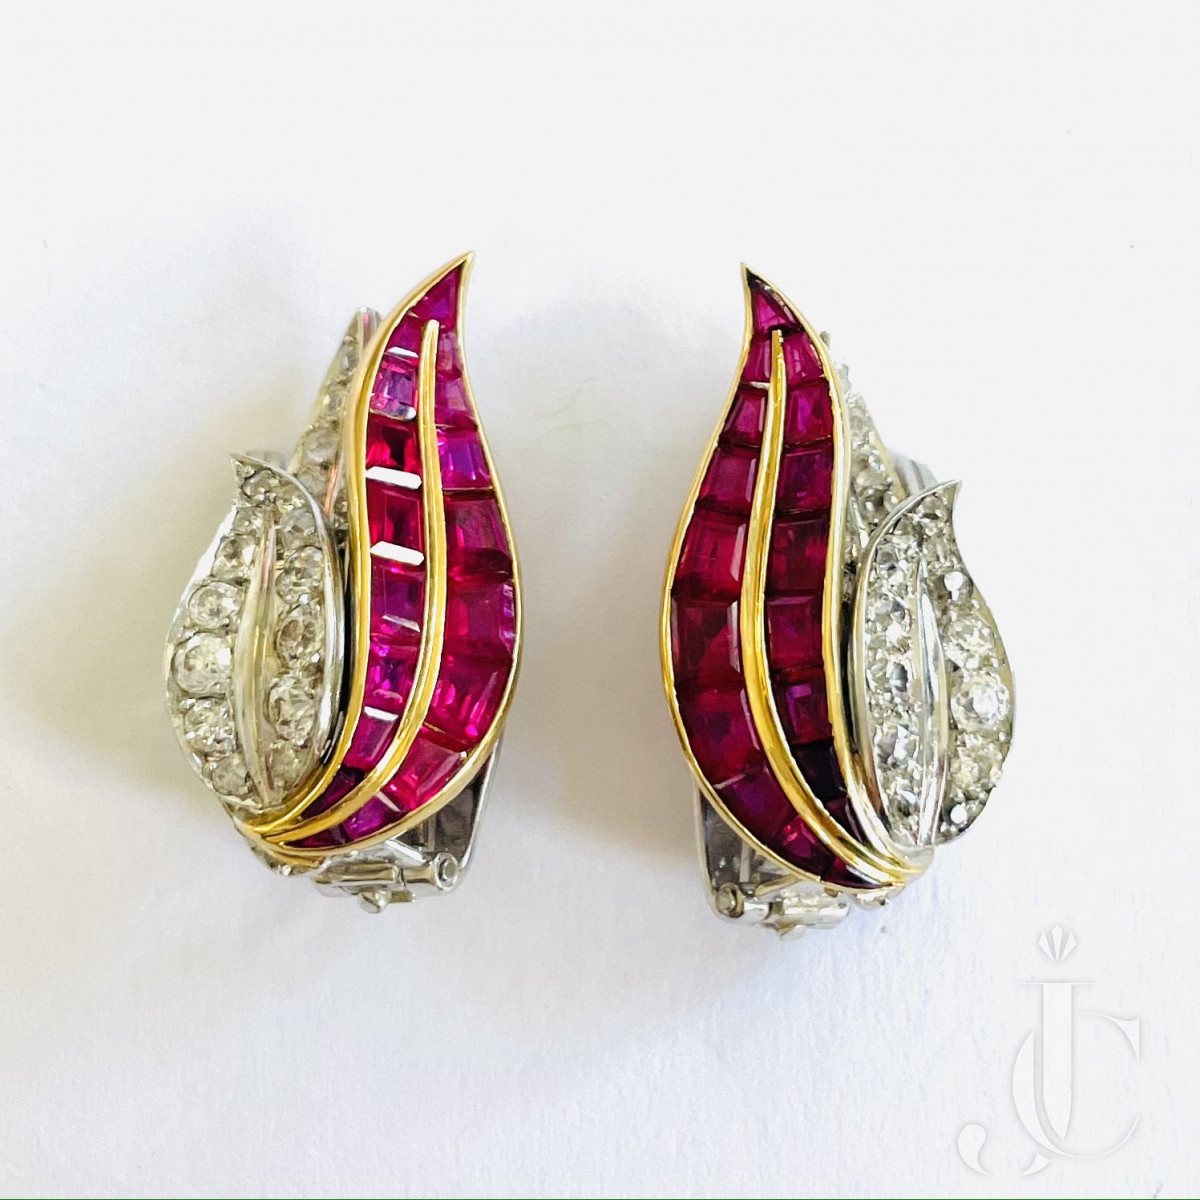 Rene Boivin Ruby Diamond Ear Clips